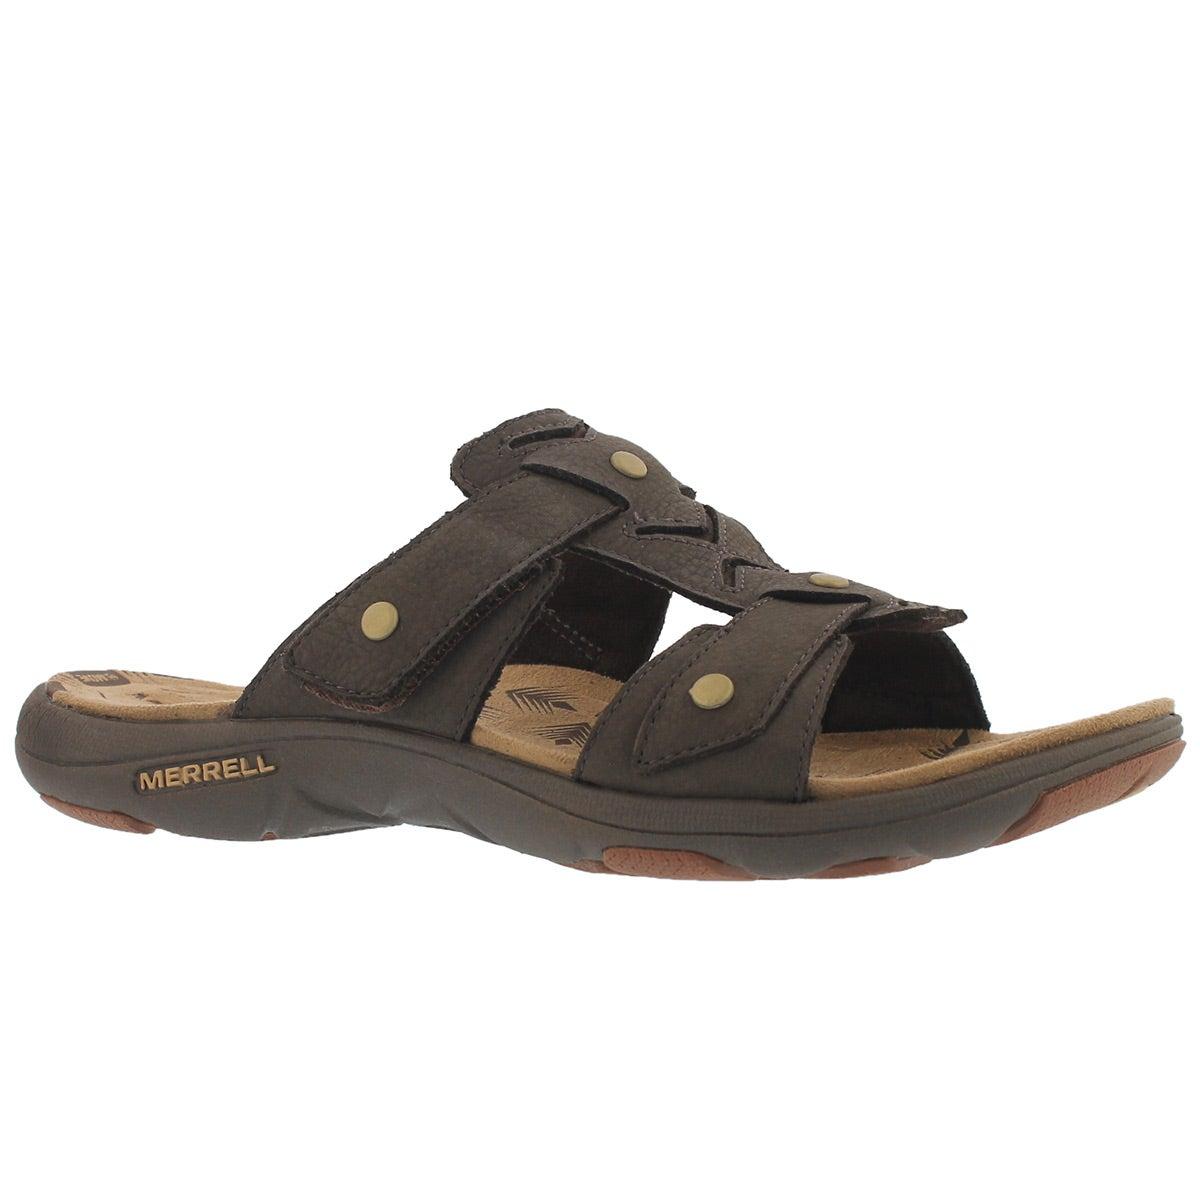 Women's ADHERA SLIDE brown casual slide sandals